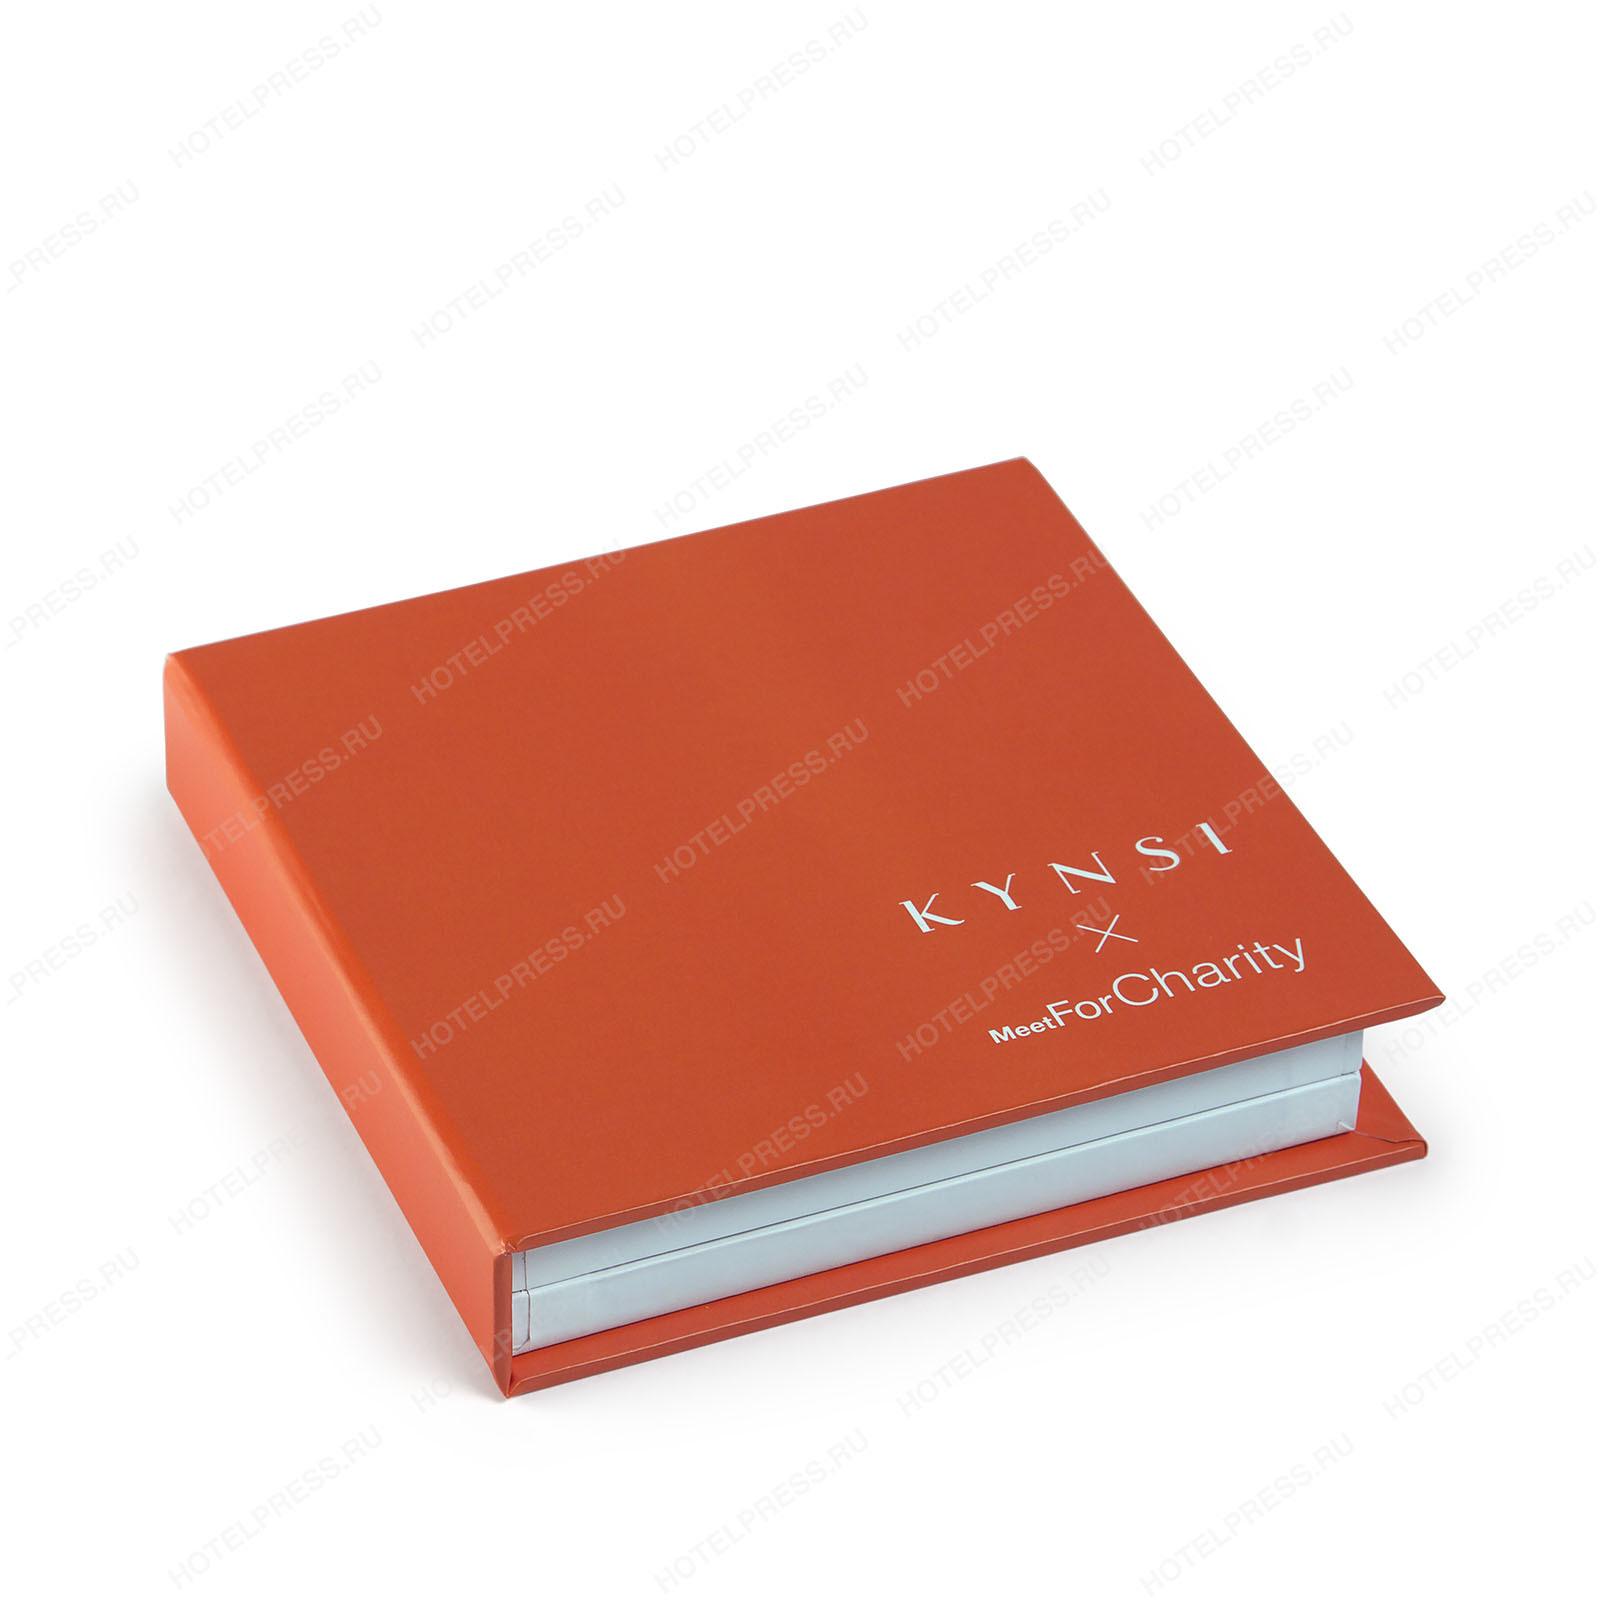 Коробка - каталог образцов ногтей для салона красоты